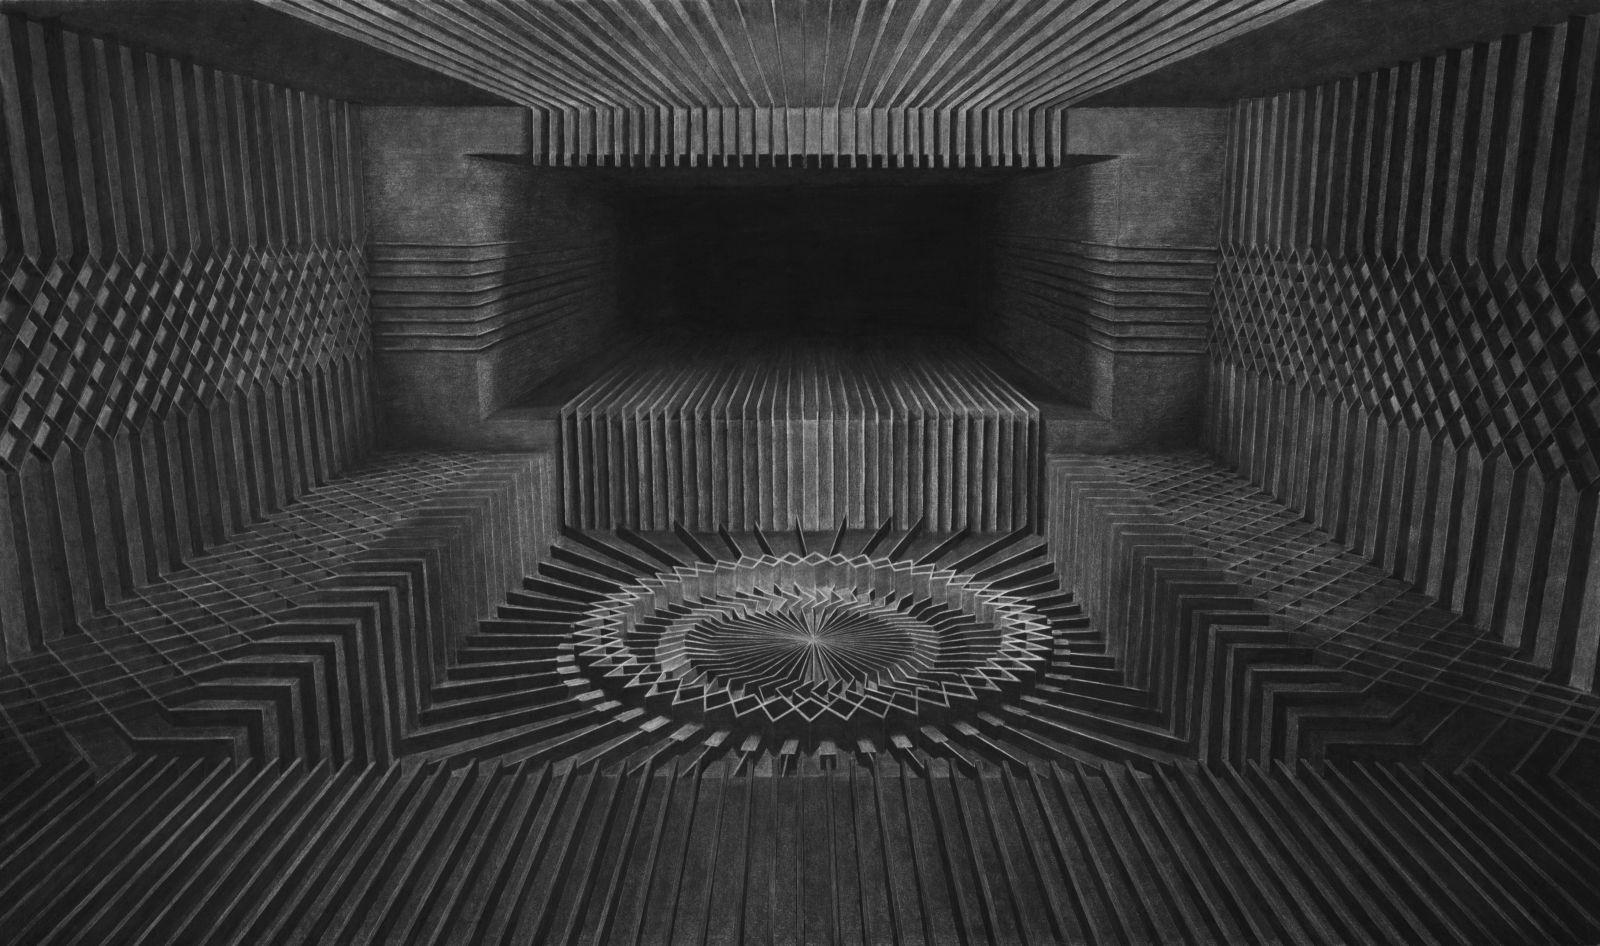 Charcoal drawing   2017   73 x 51 cm